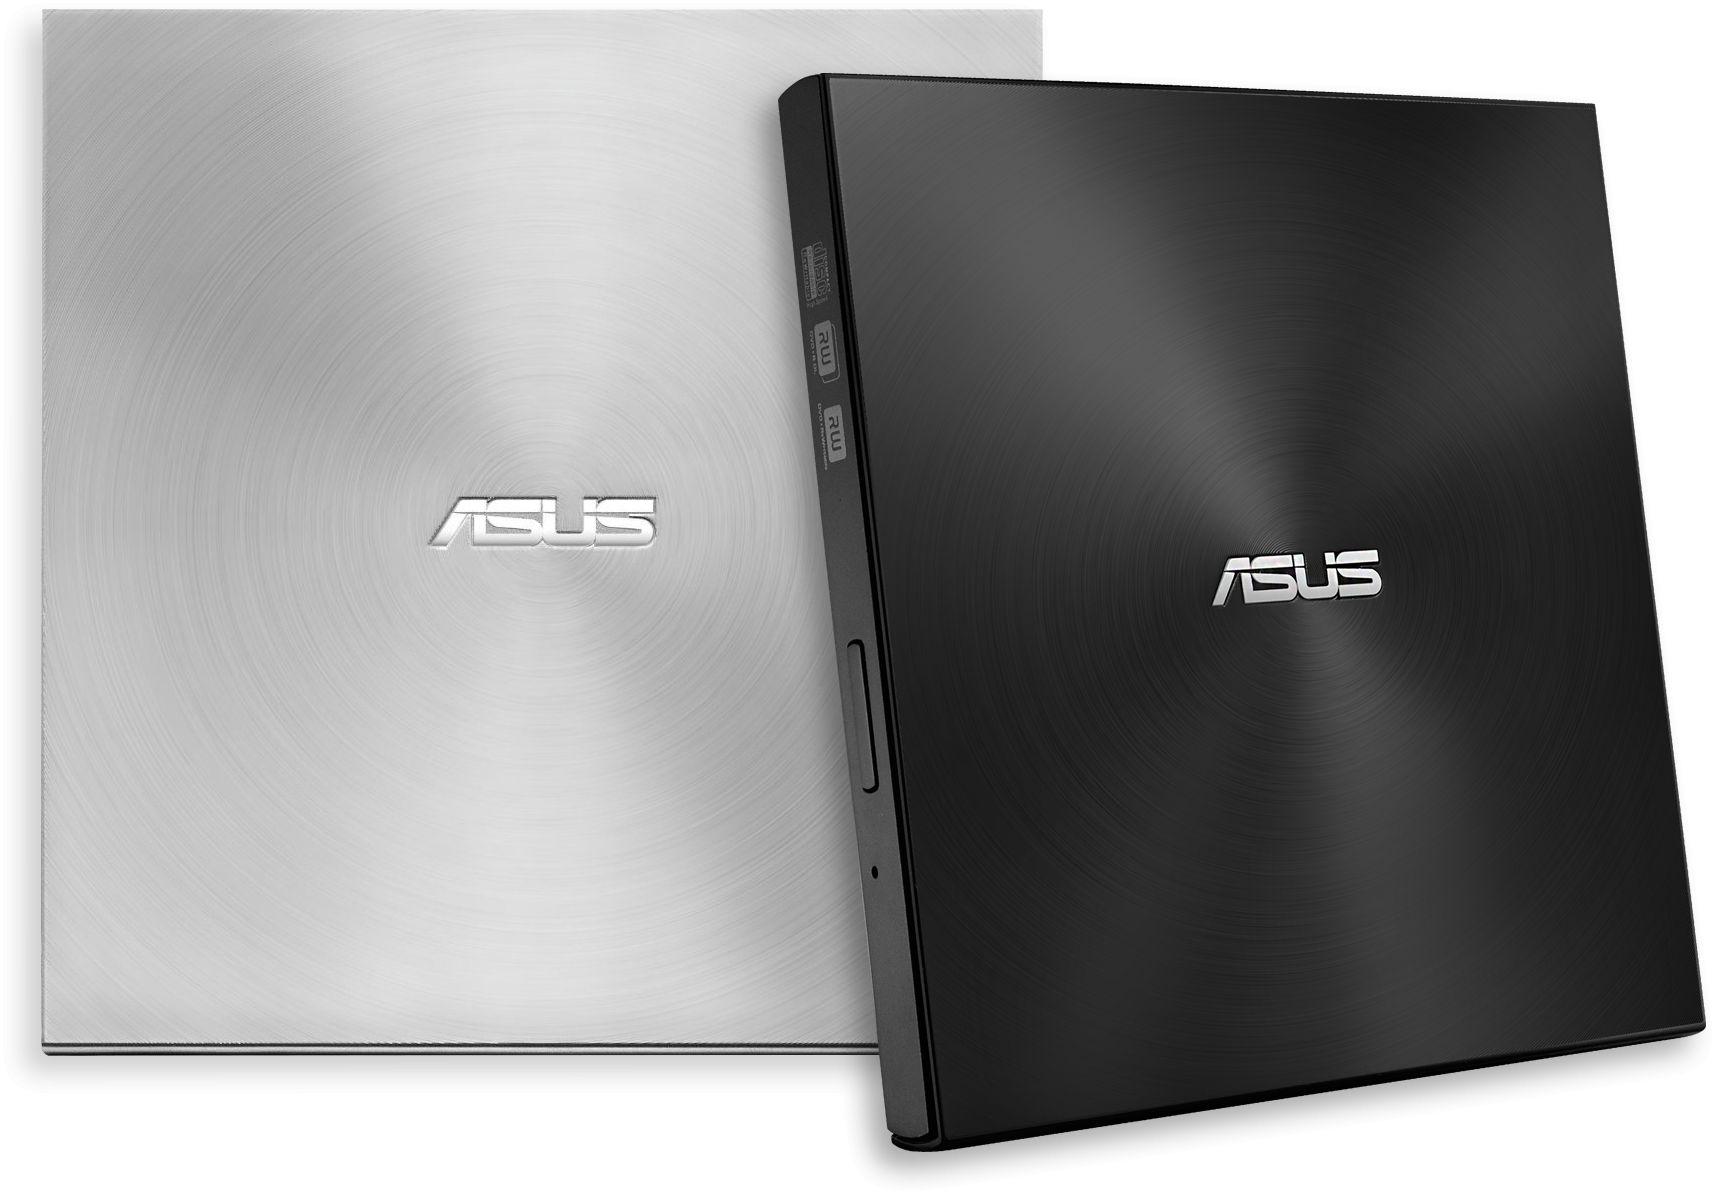 ASUS ZenDrive SDRW-08U7M-U External DVD Re-Writers